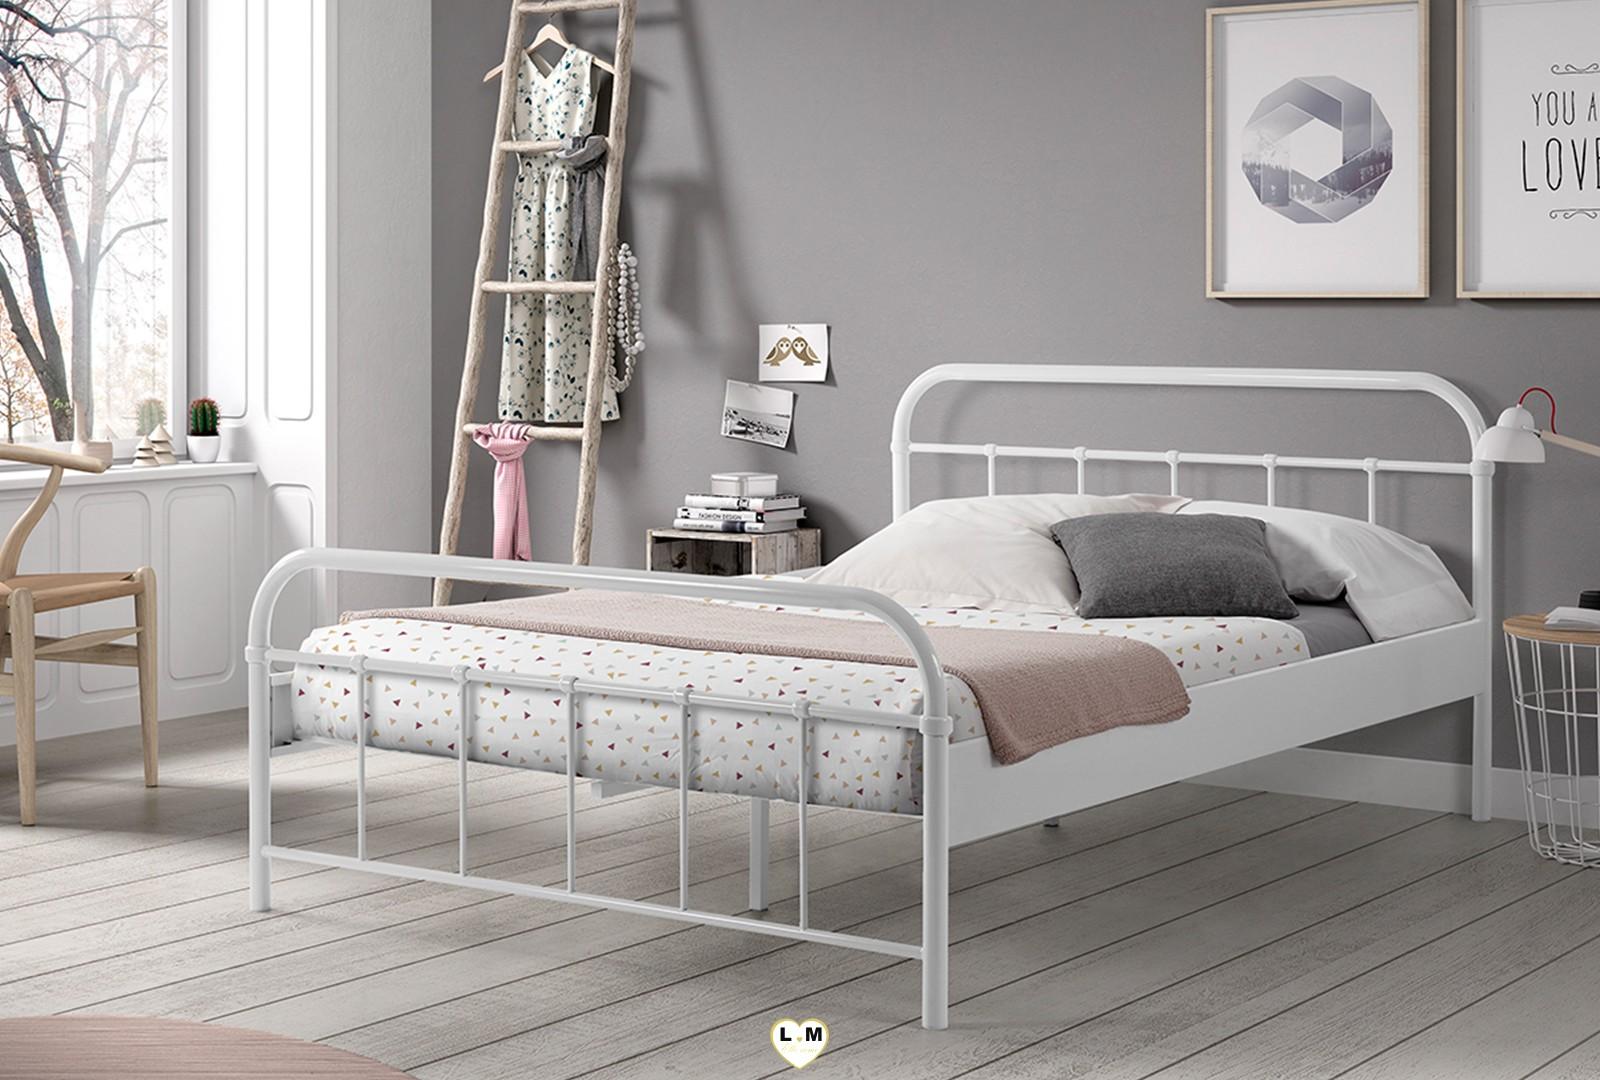 boson lit metal 2 places lignemeuble com. Black Bedroom Furniture Sets. Home Design Ideas